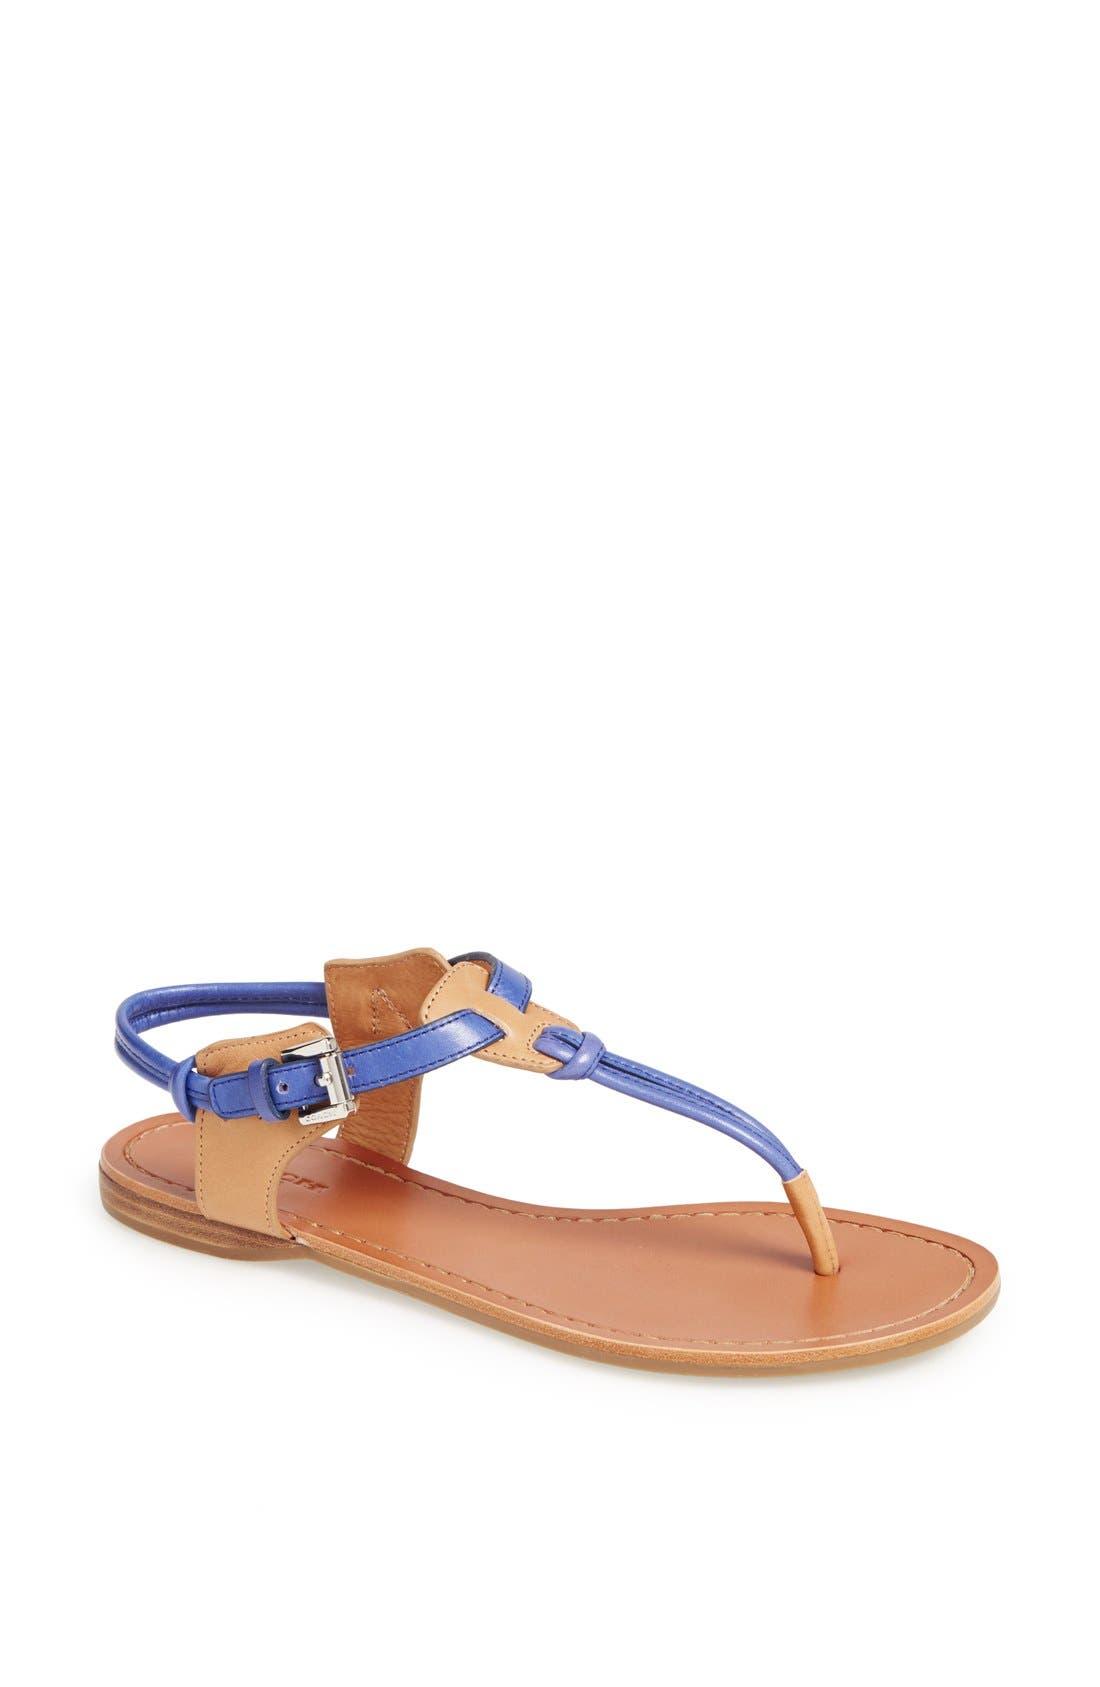 Alternate Image 1 Selected - COACH 'Clarkson' Sandal